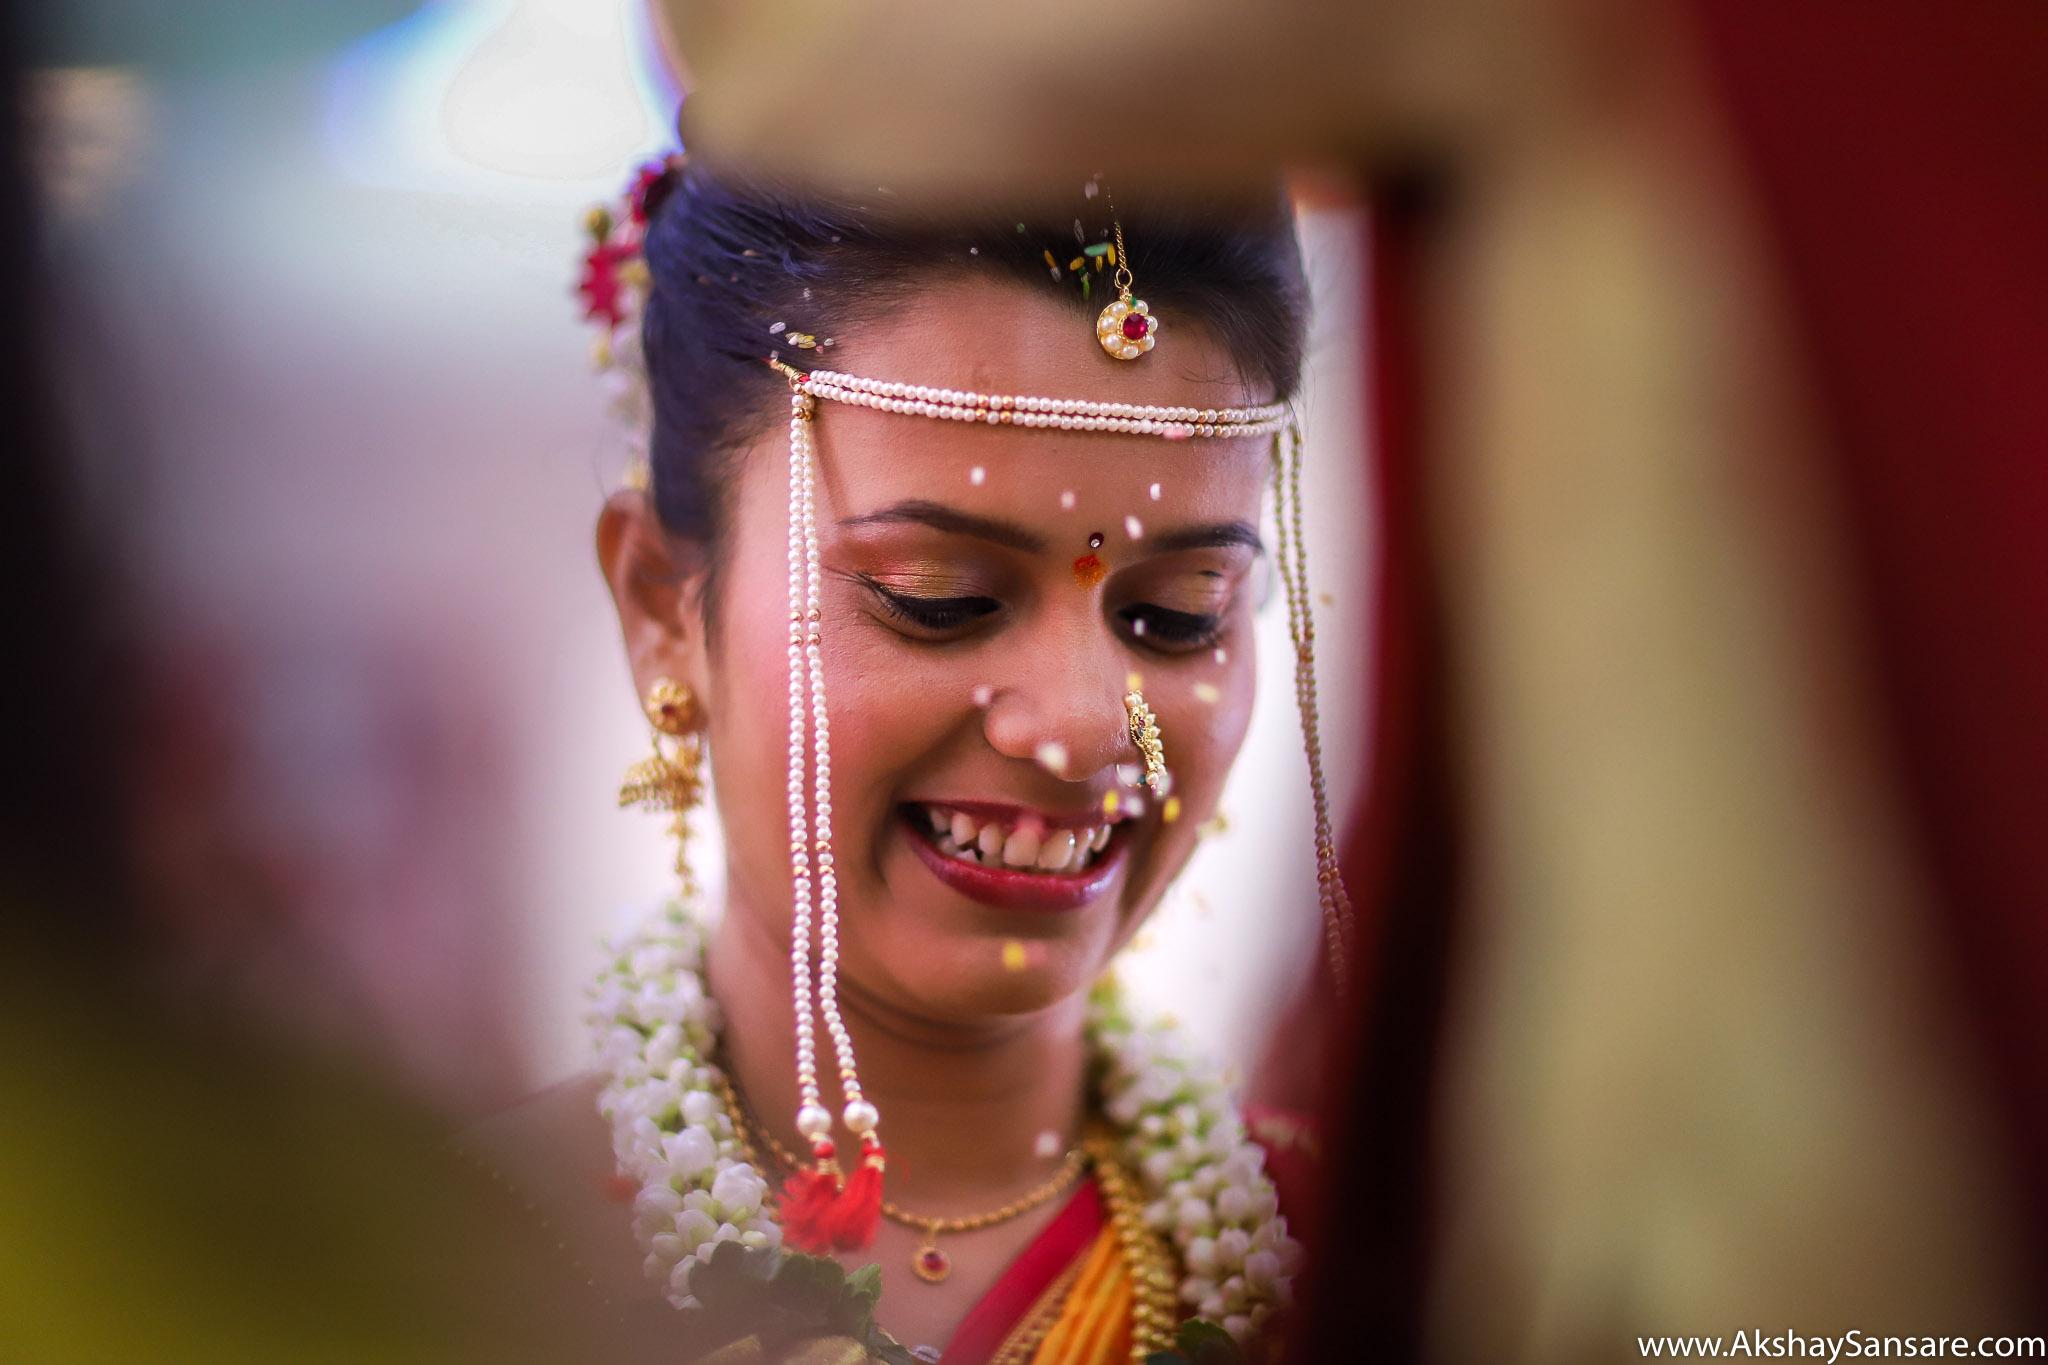 Aditya x Poonam Blog Akshay Sansare Photography Candid Photographer in Mumbai Best Cinematic wedding film filmer-12.jpg